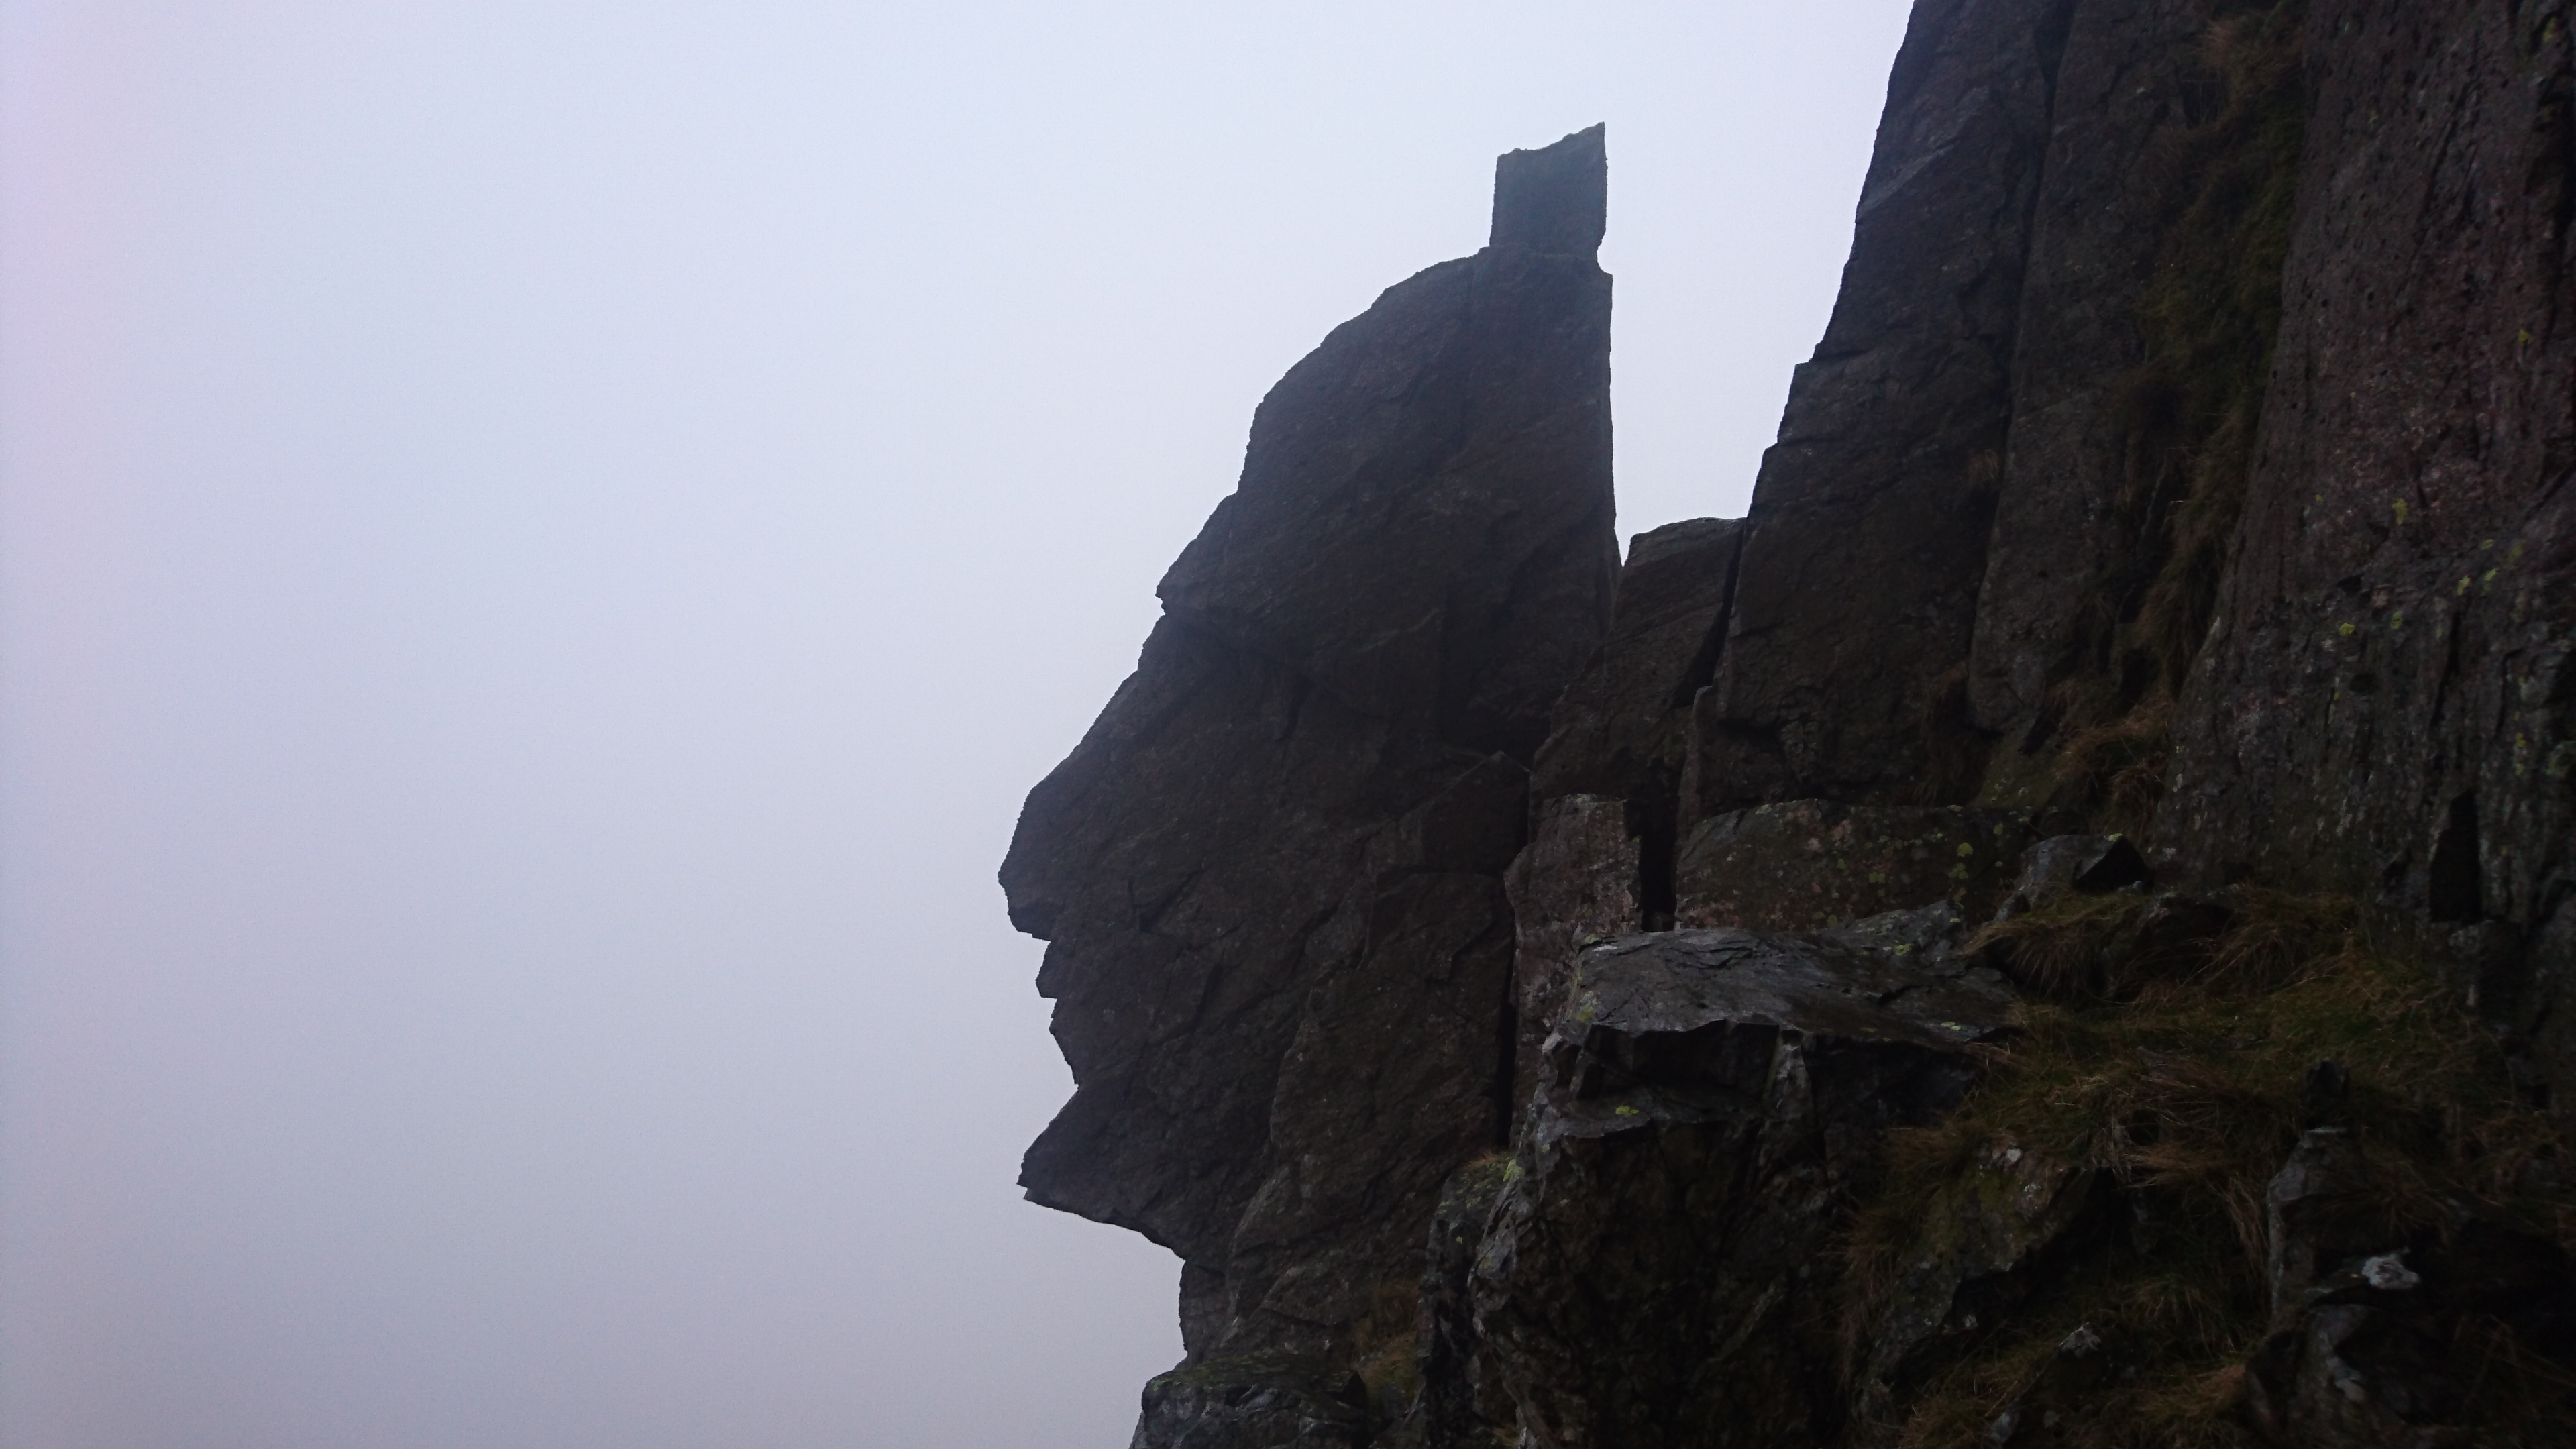 Sphynx Rock